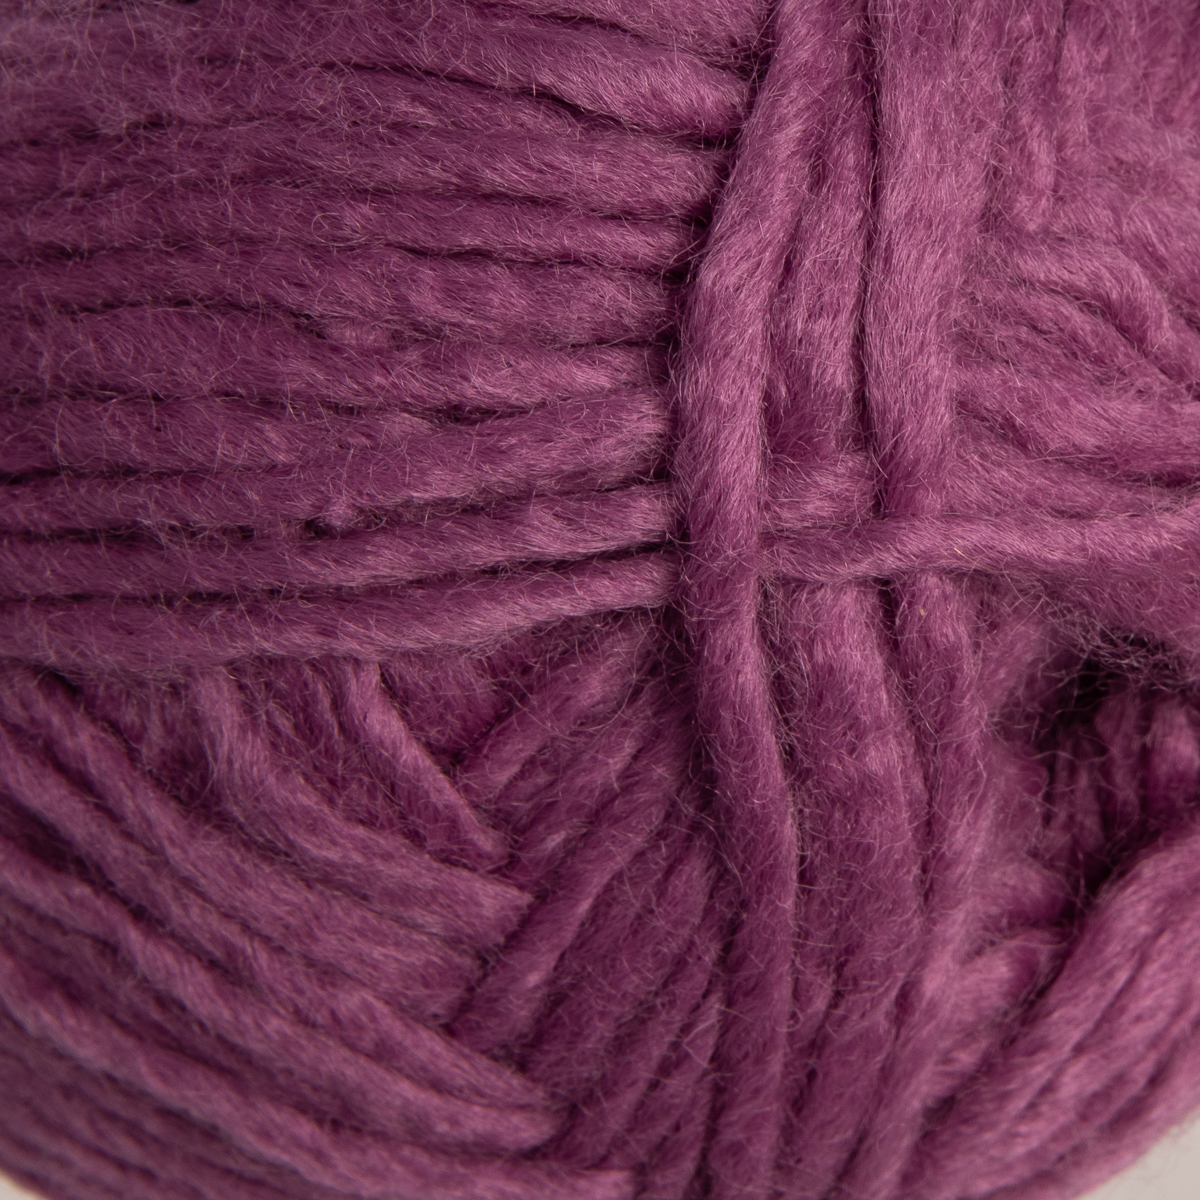 3pk-Lion-Brand-New-Basic-Acrylic-amp-Wool-Yarn-Medium-4-Knit-Crochet-Skeins-Soft thumbnail 75